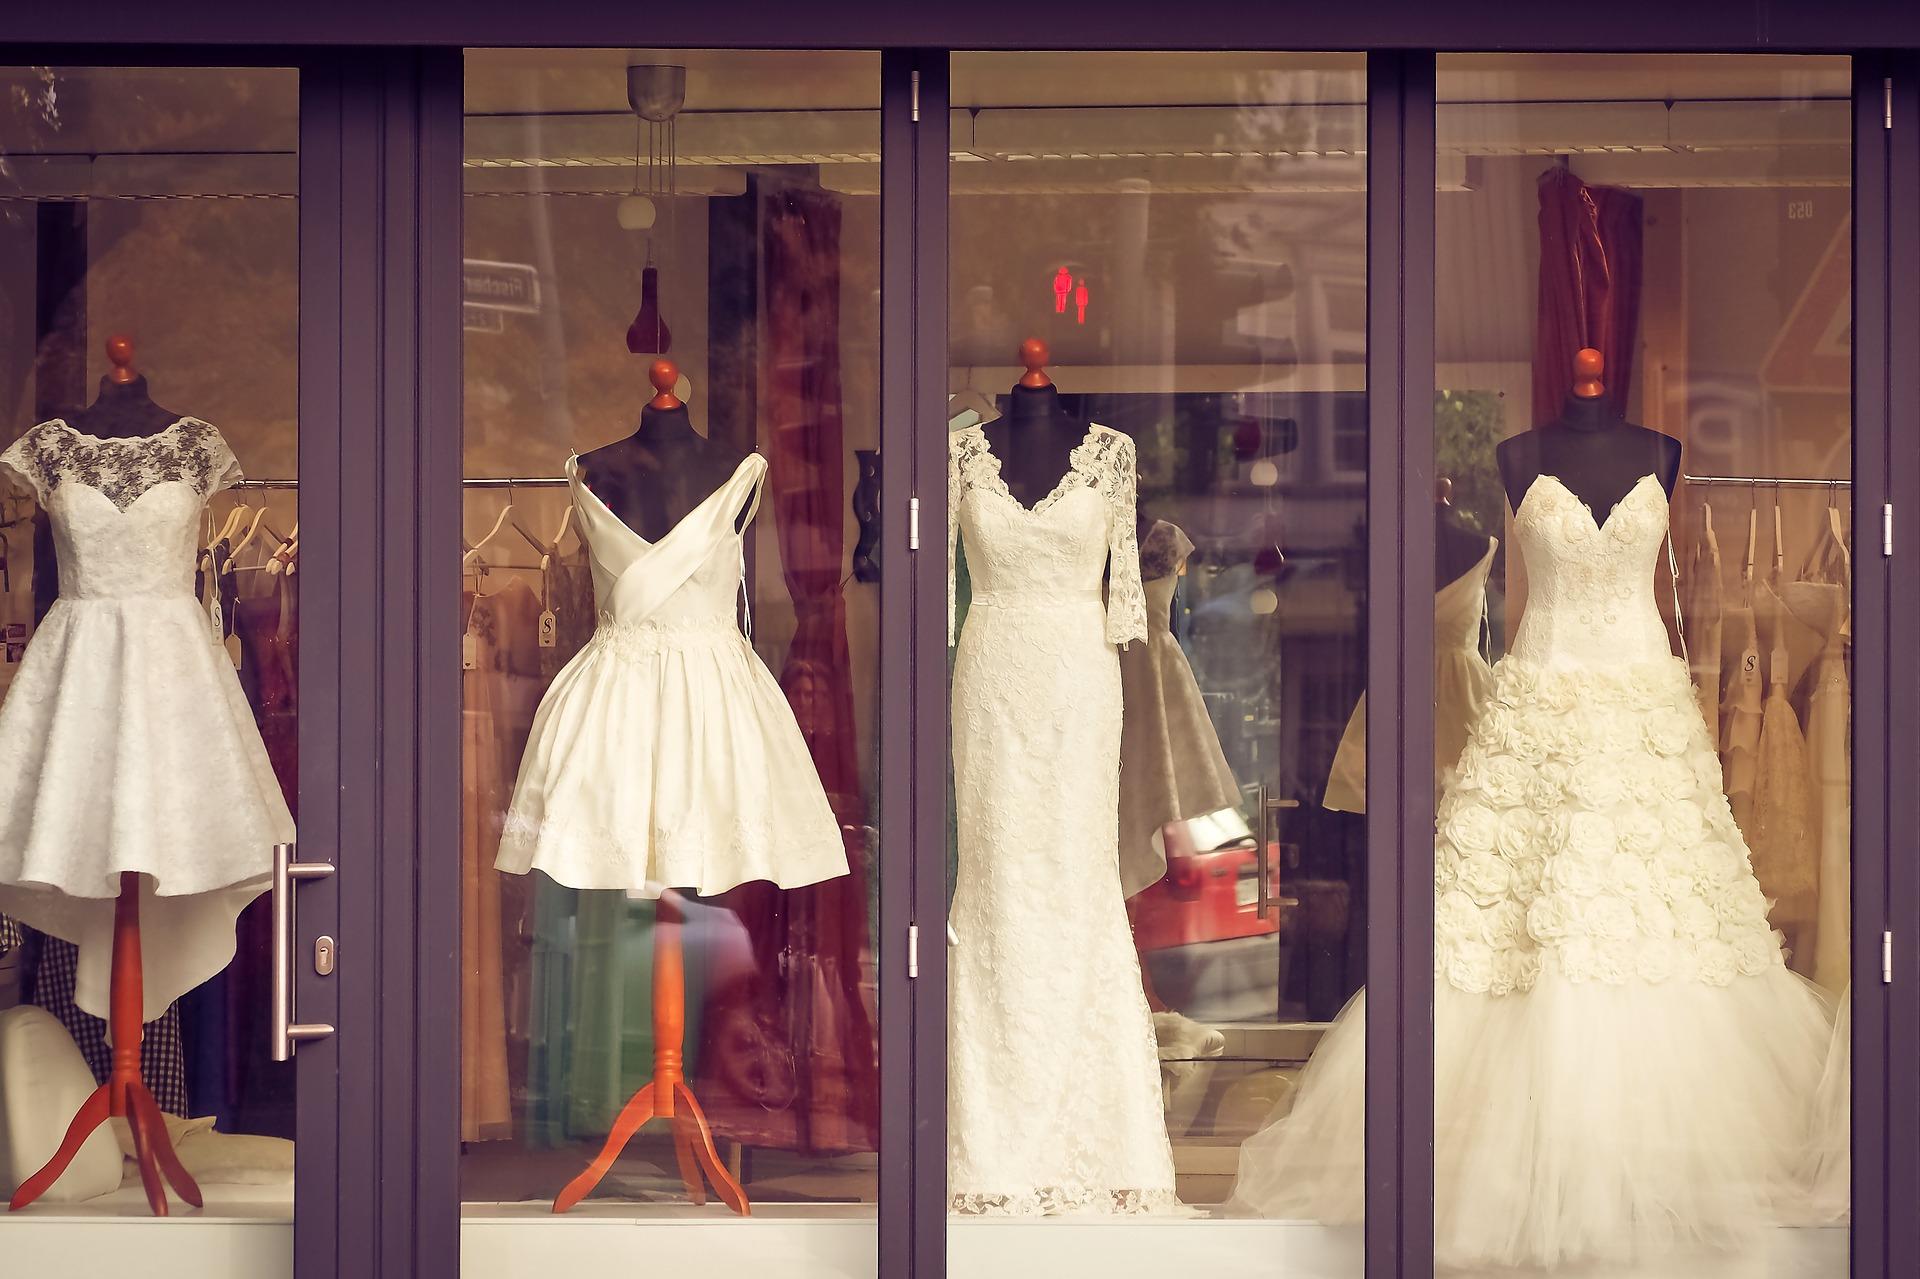 Das Brautkleid - Smarboo